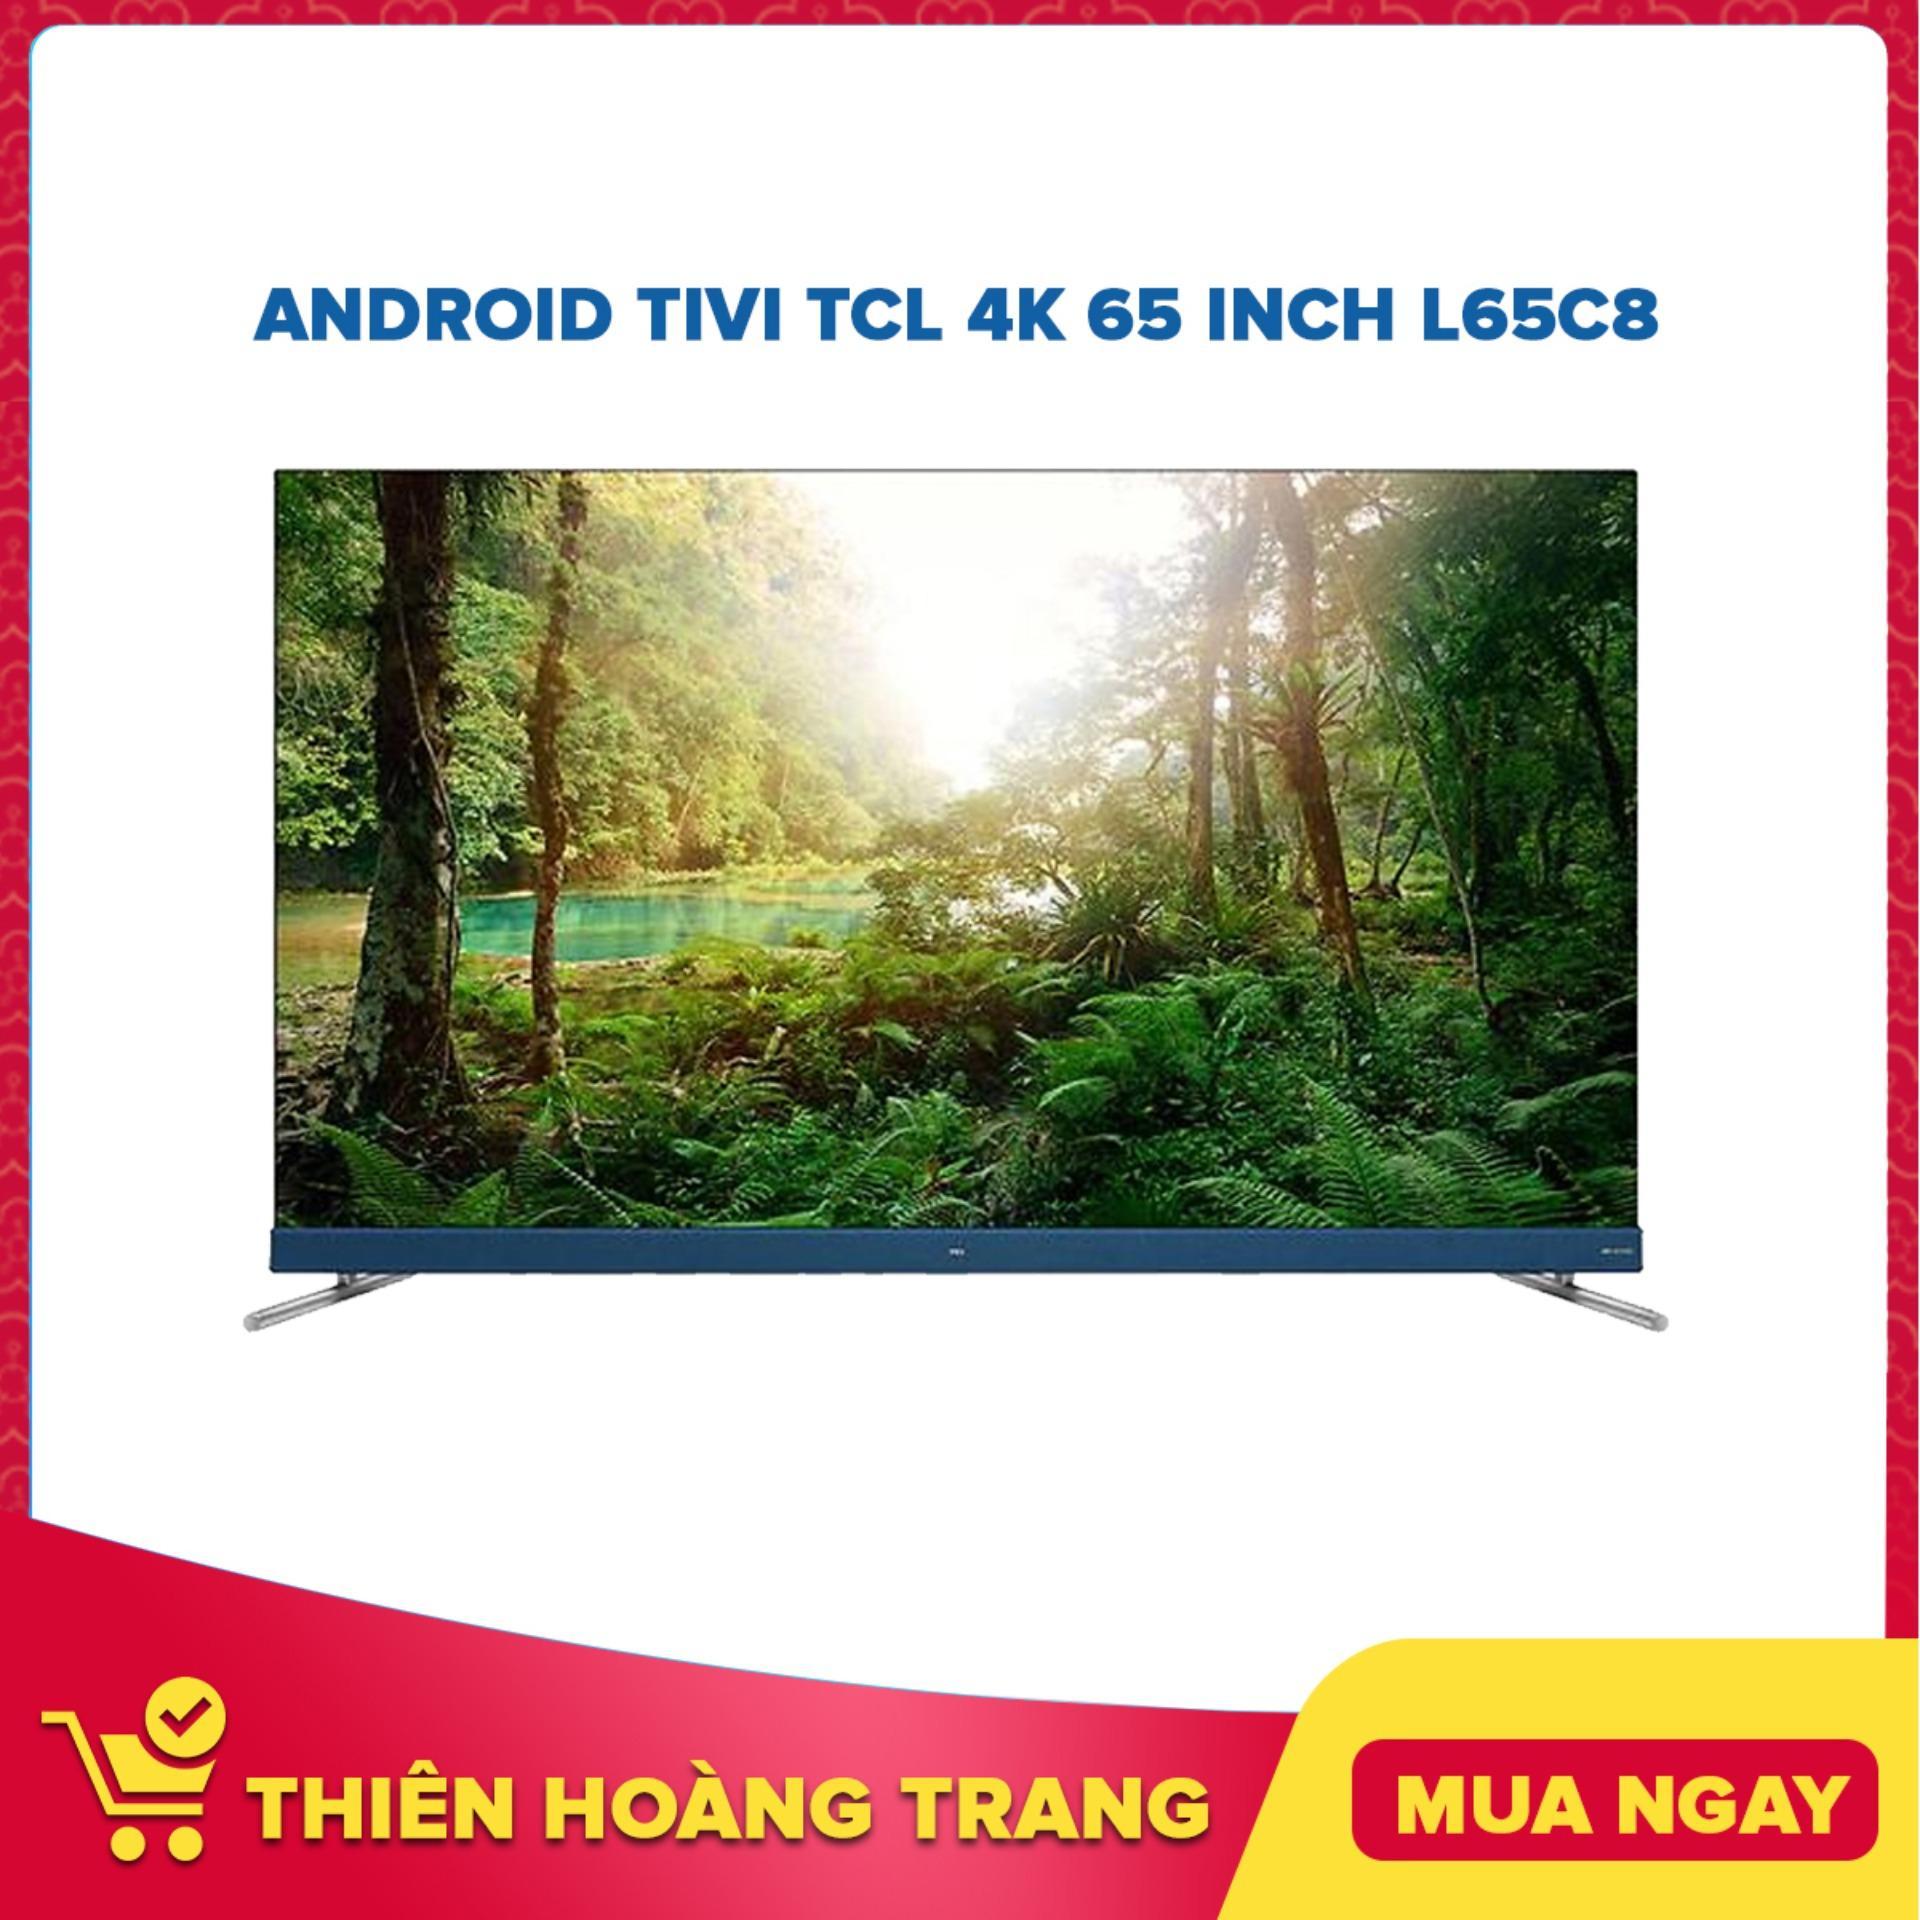 Bảng giá Android Tivi TCL 4K 65 inch L65C8